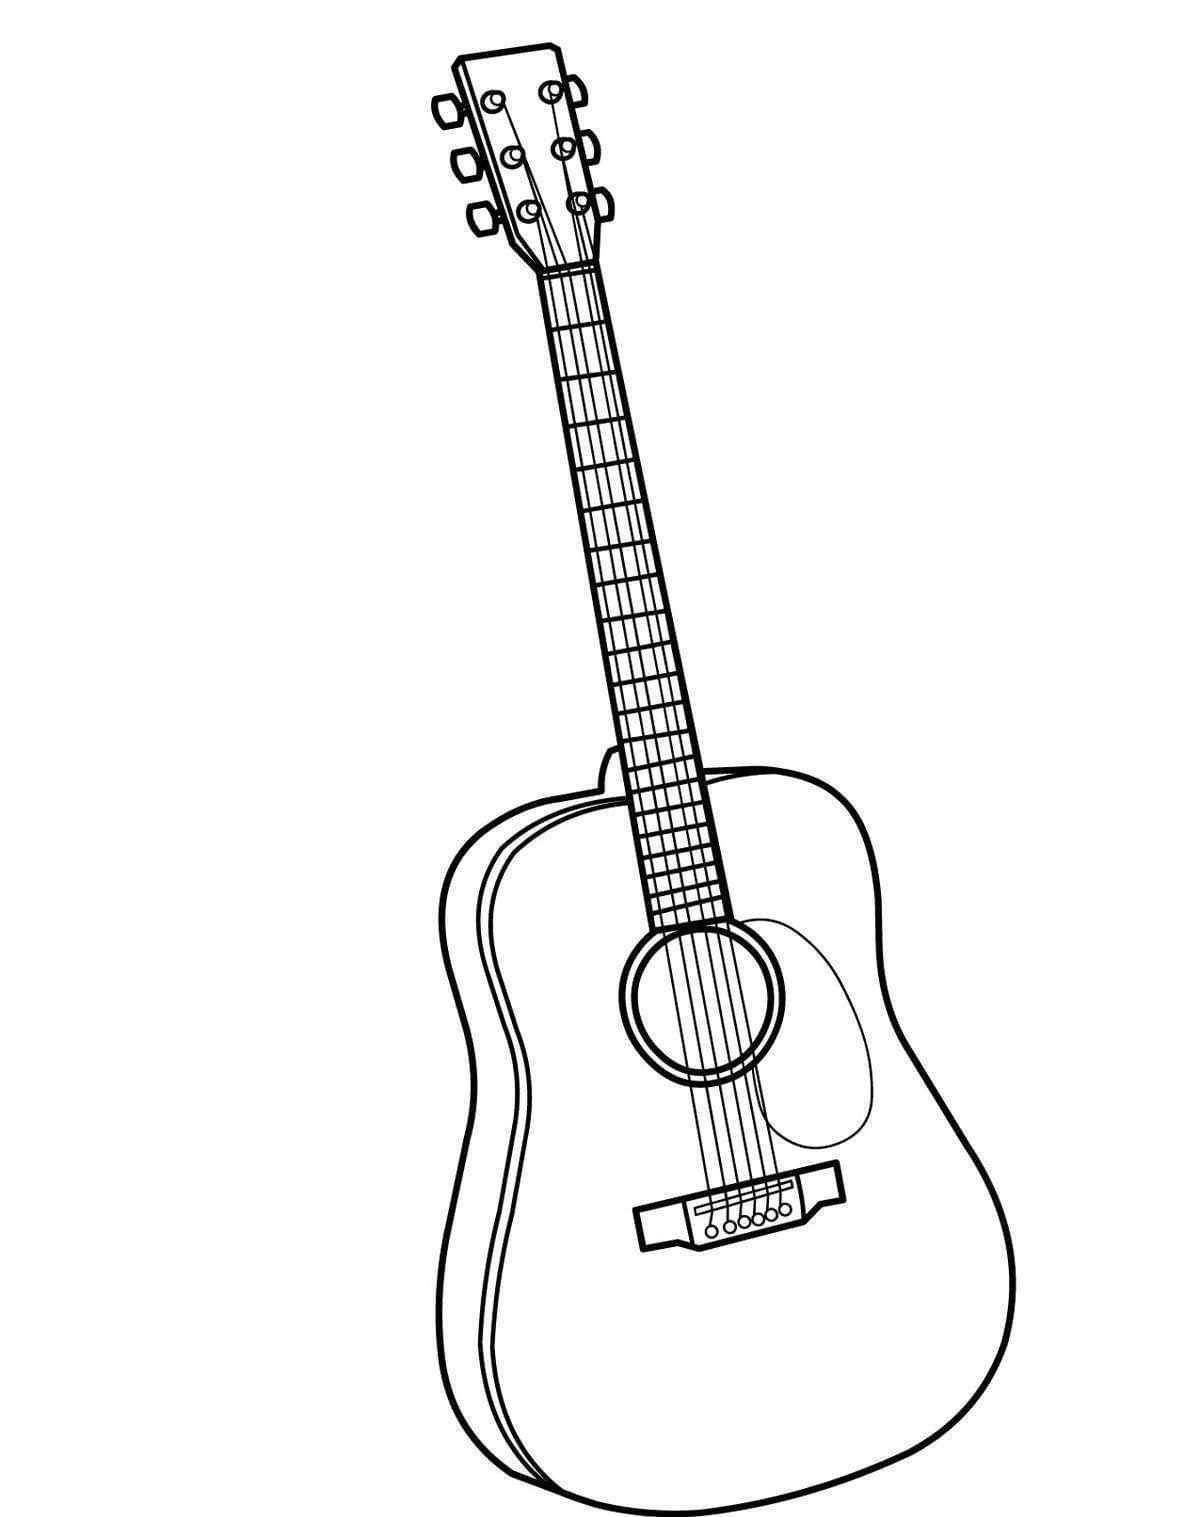 Gitar Boyama Sayfasi Gitar Cizimler Muzik